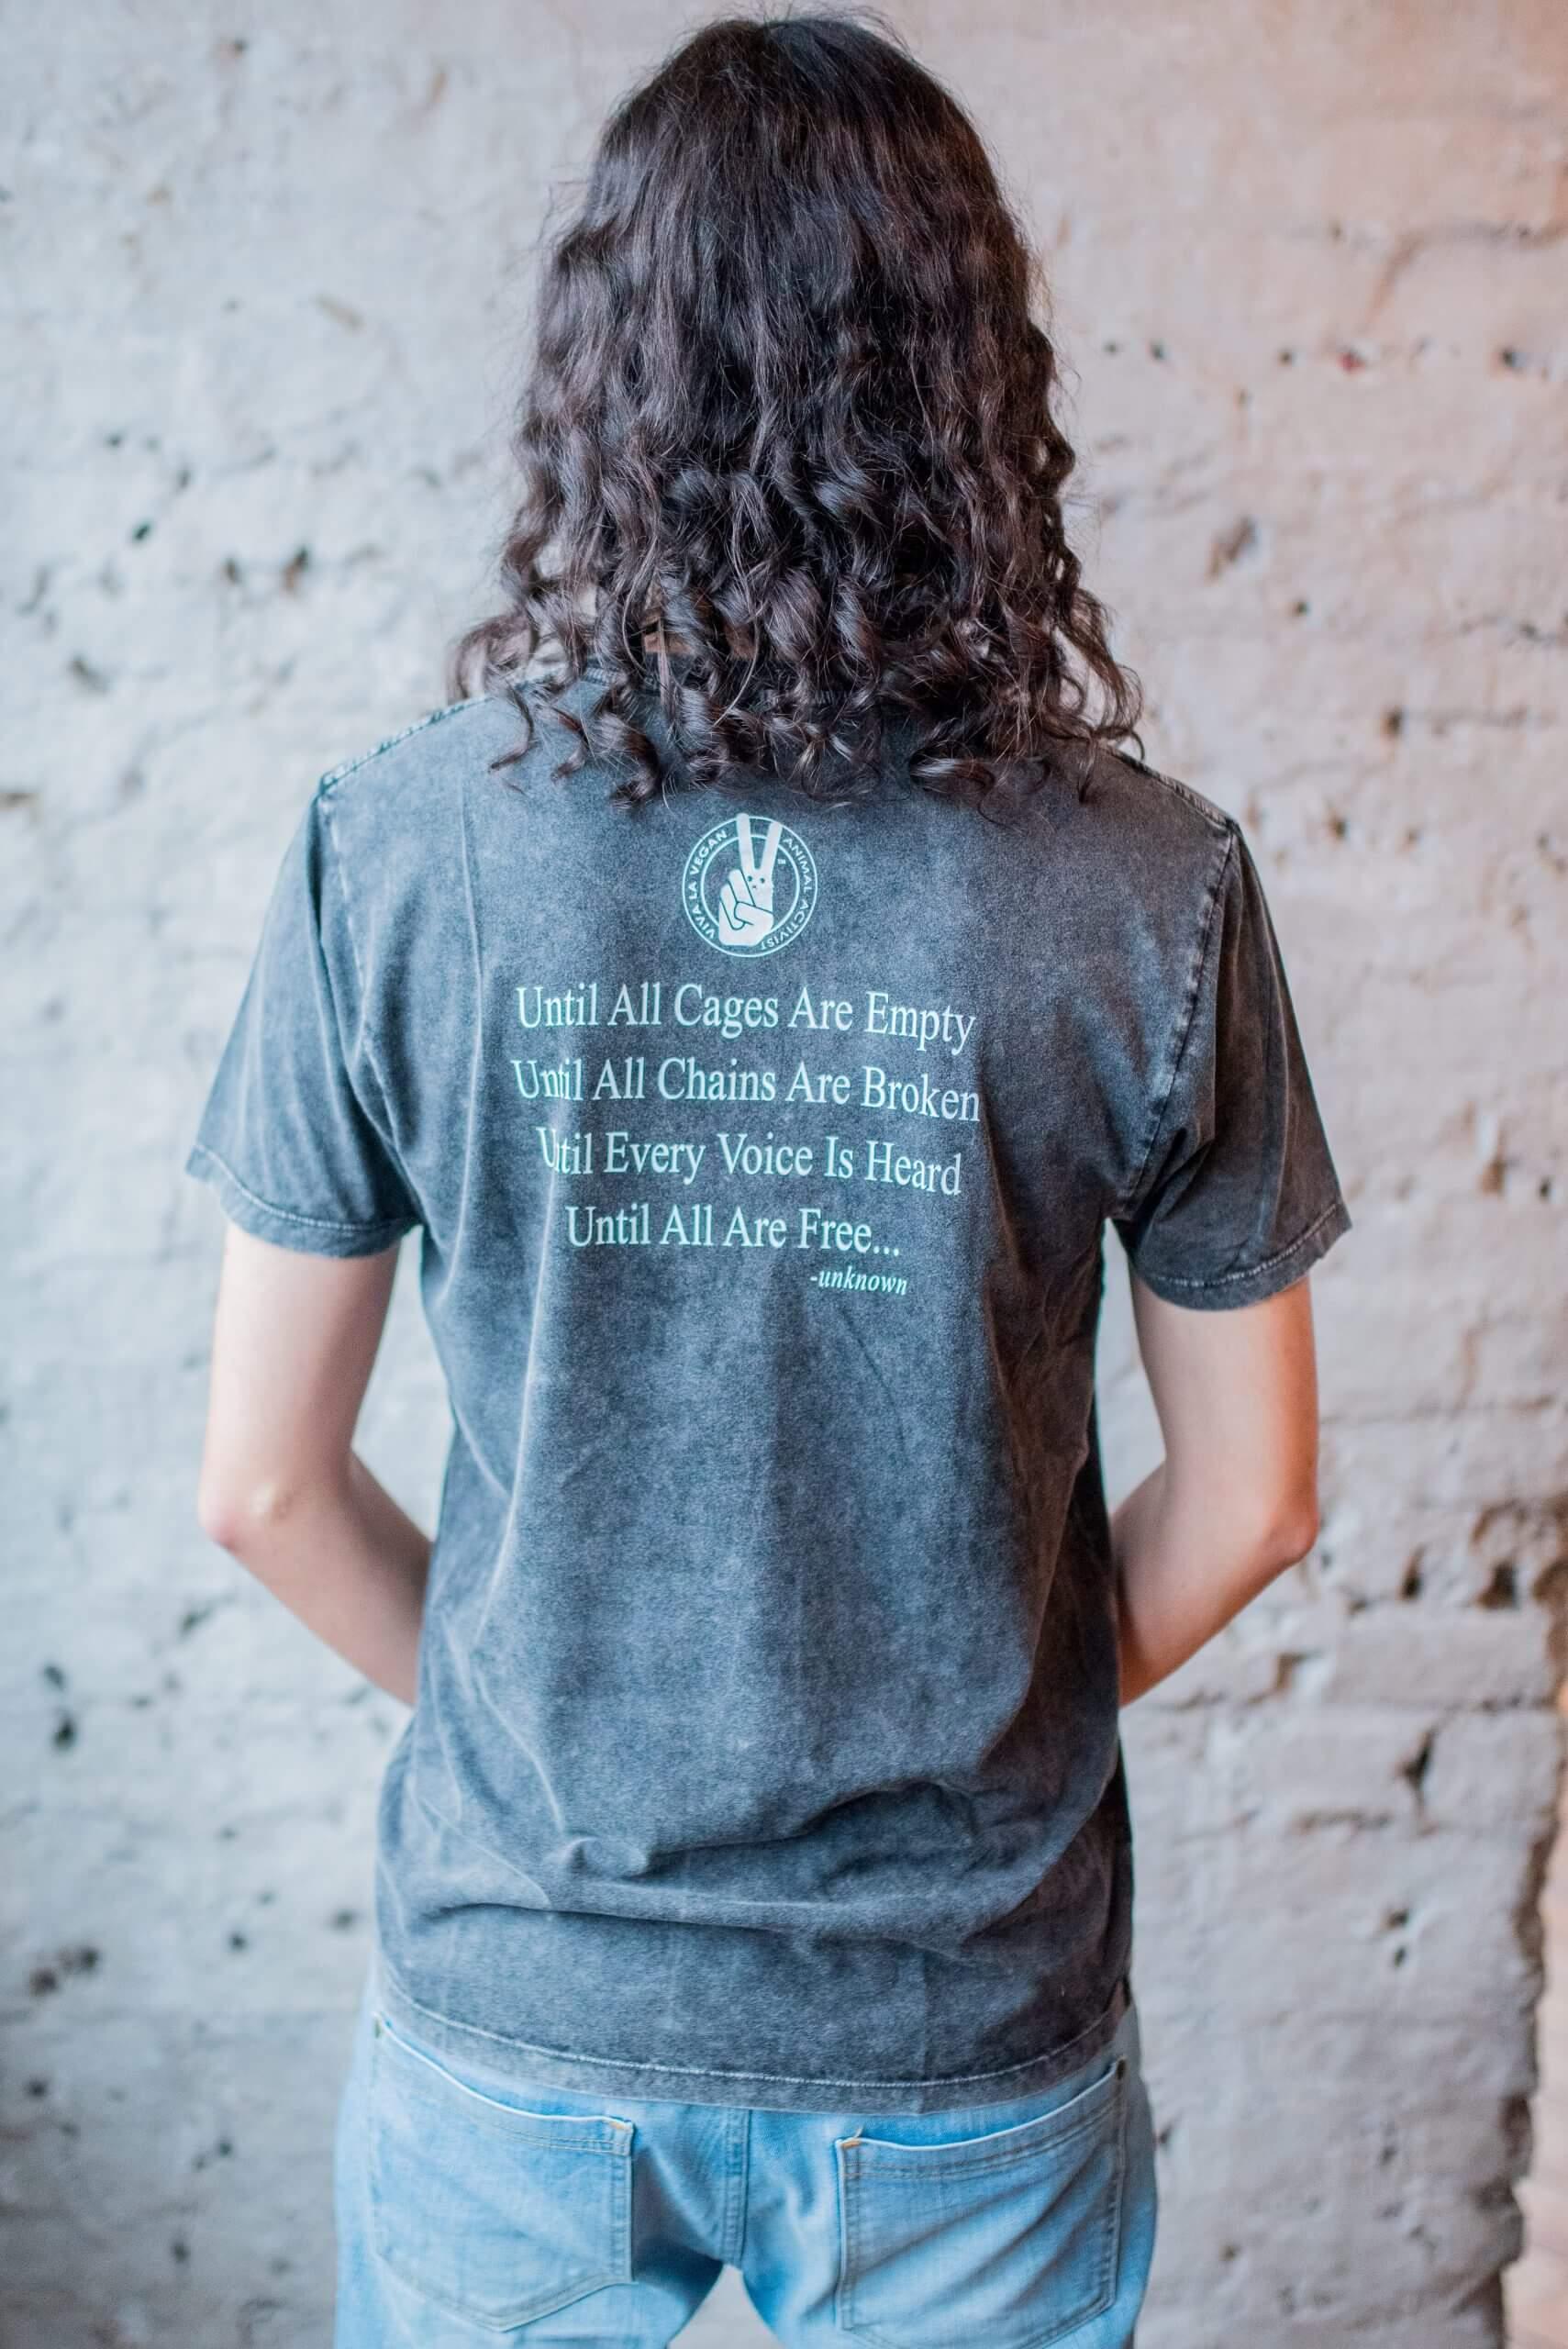 Male Model Wearing Acid Wash Break The Cycle Vegan Statement T Shirt